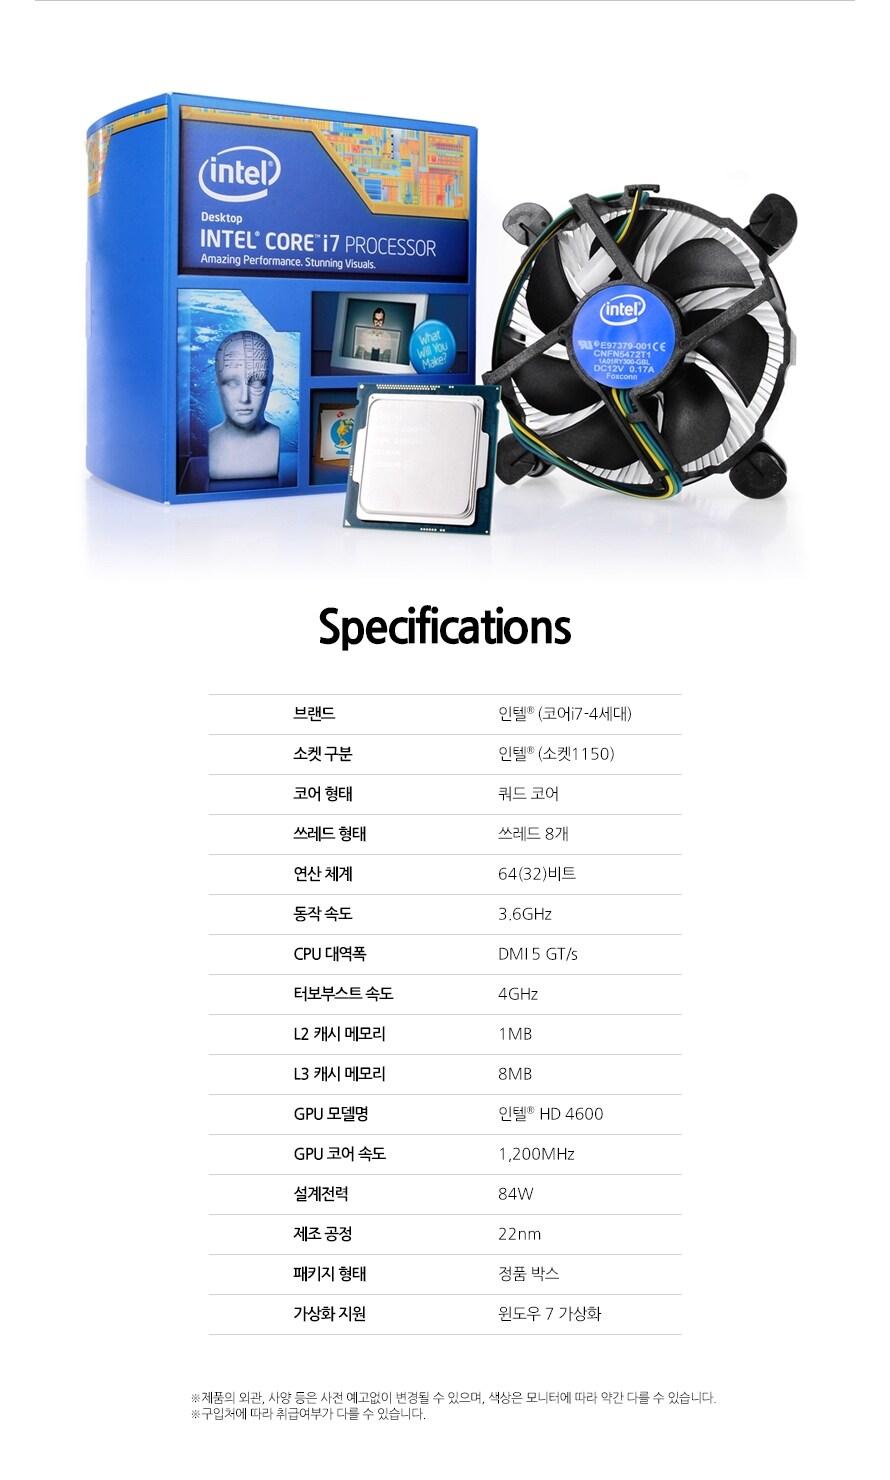 Specifications브랜드인텔 (코어i7-4세대)소켓 구분인텔 (소켓1150)코어 형태쿼드 코어쓰레드 형태쓰레드 8개연산 체계64(32)비트동작 속도3.6GHzCPU 대역폭DMI 5 GT/s터보부스트 속도4GHzL2 캐시 메모리1MBL3 캐시 메모리8MBGPU 모델명인텔 HD 4600GPU 코어 속도1,200MHz설계전력84W제조 공정22nm패키지 형태정품 박스가상화 지원윈도우 7 가상화제품의 외관, 사양 등은 사전 예고없이 변경될 수 있으며, 색상은 모니터에 따라 약간 다를 수 있습니다.구입처에 따라 취급여부가 다를 수 있습니다.